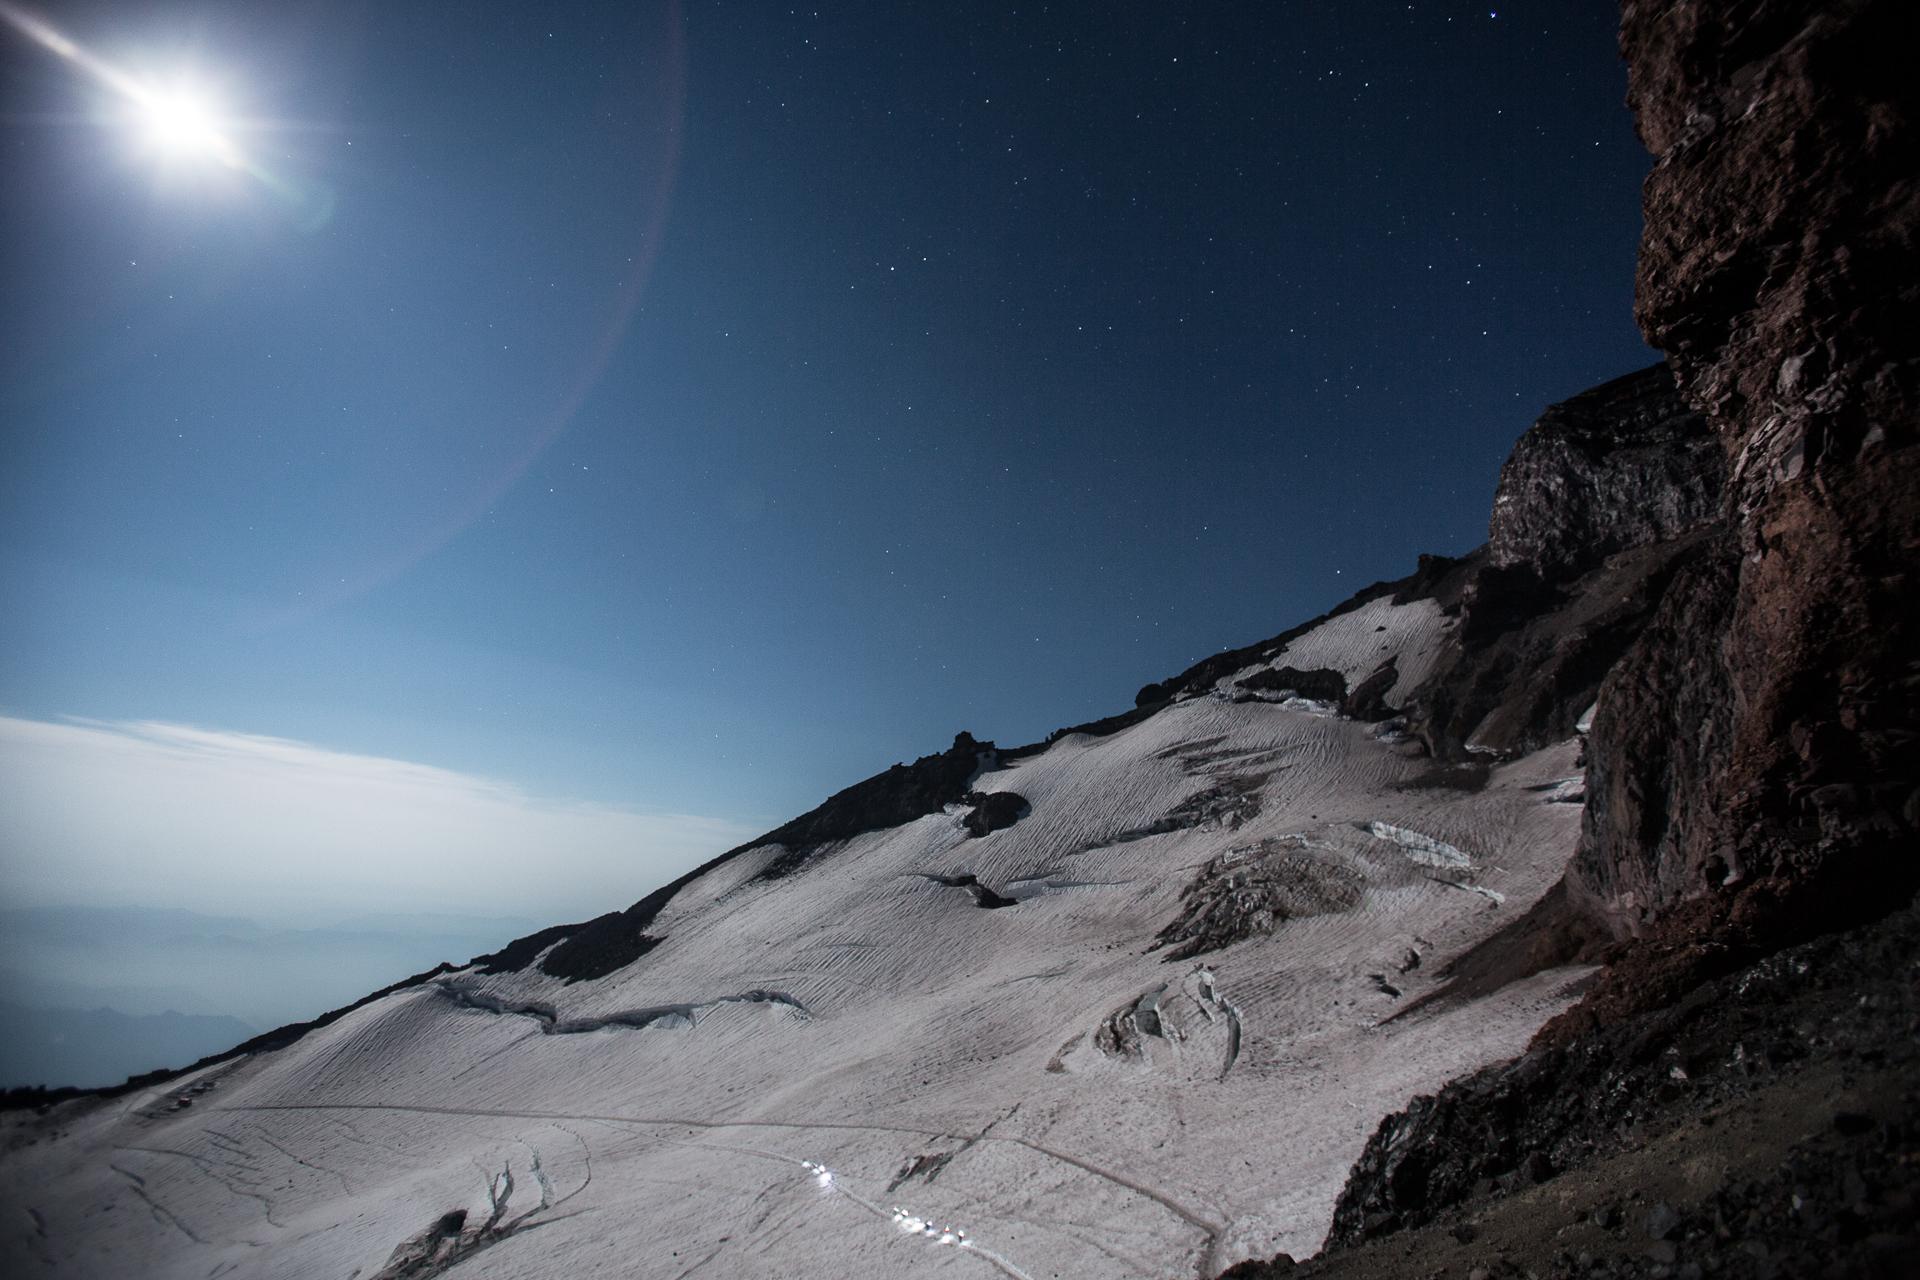 Heading across the Cowlitz Glacier under a beautiful sky.  Photo by: Luke Humphrey